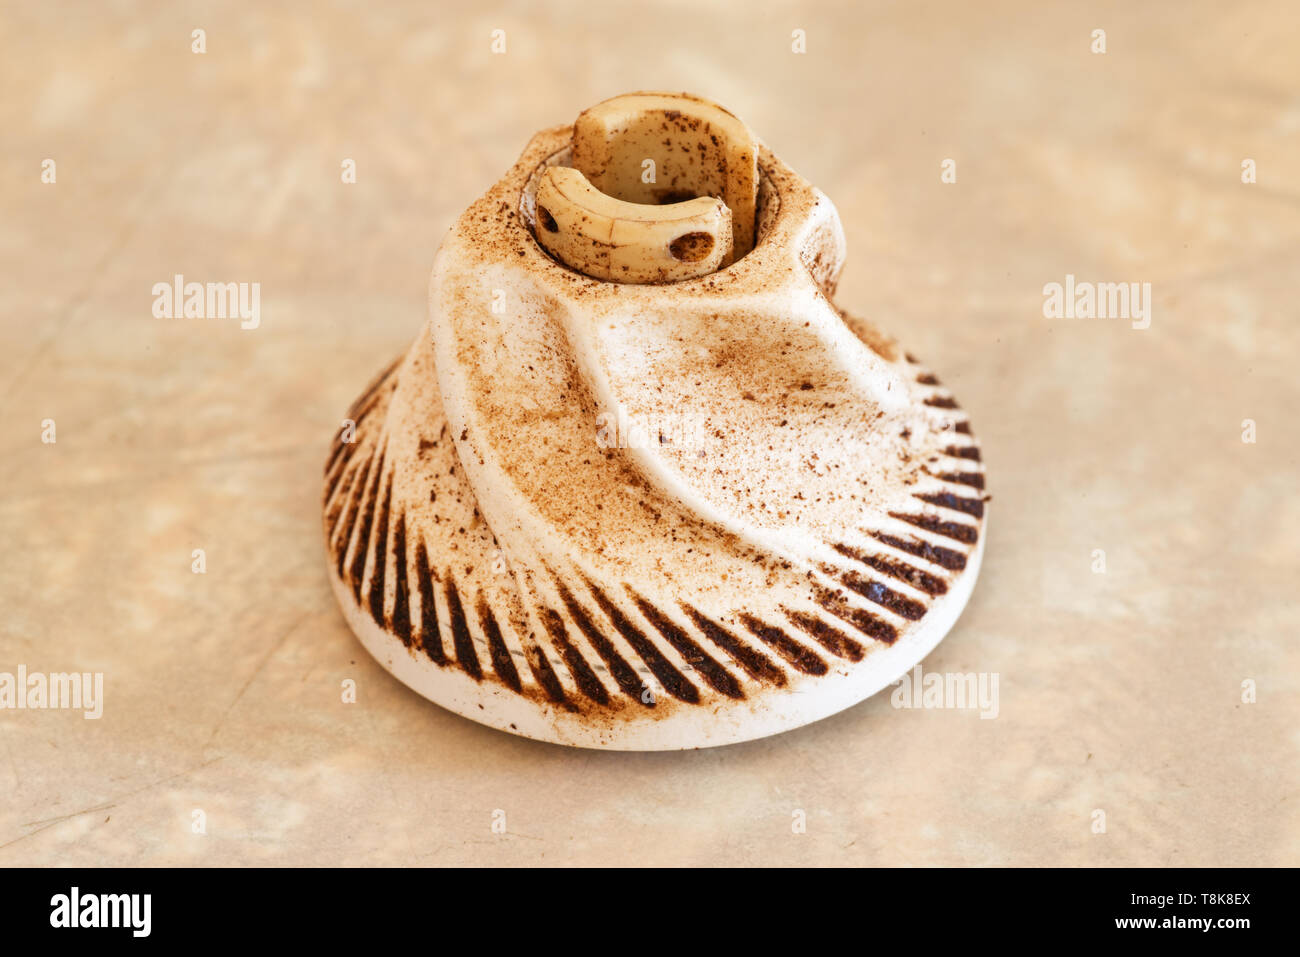 close up image of worn ceramic coffee grinder blade - Stock Image